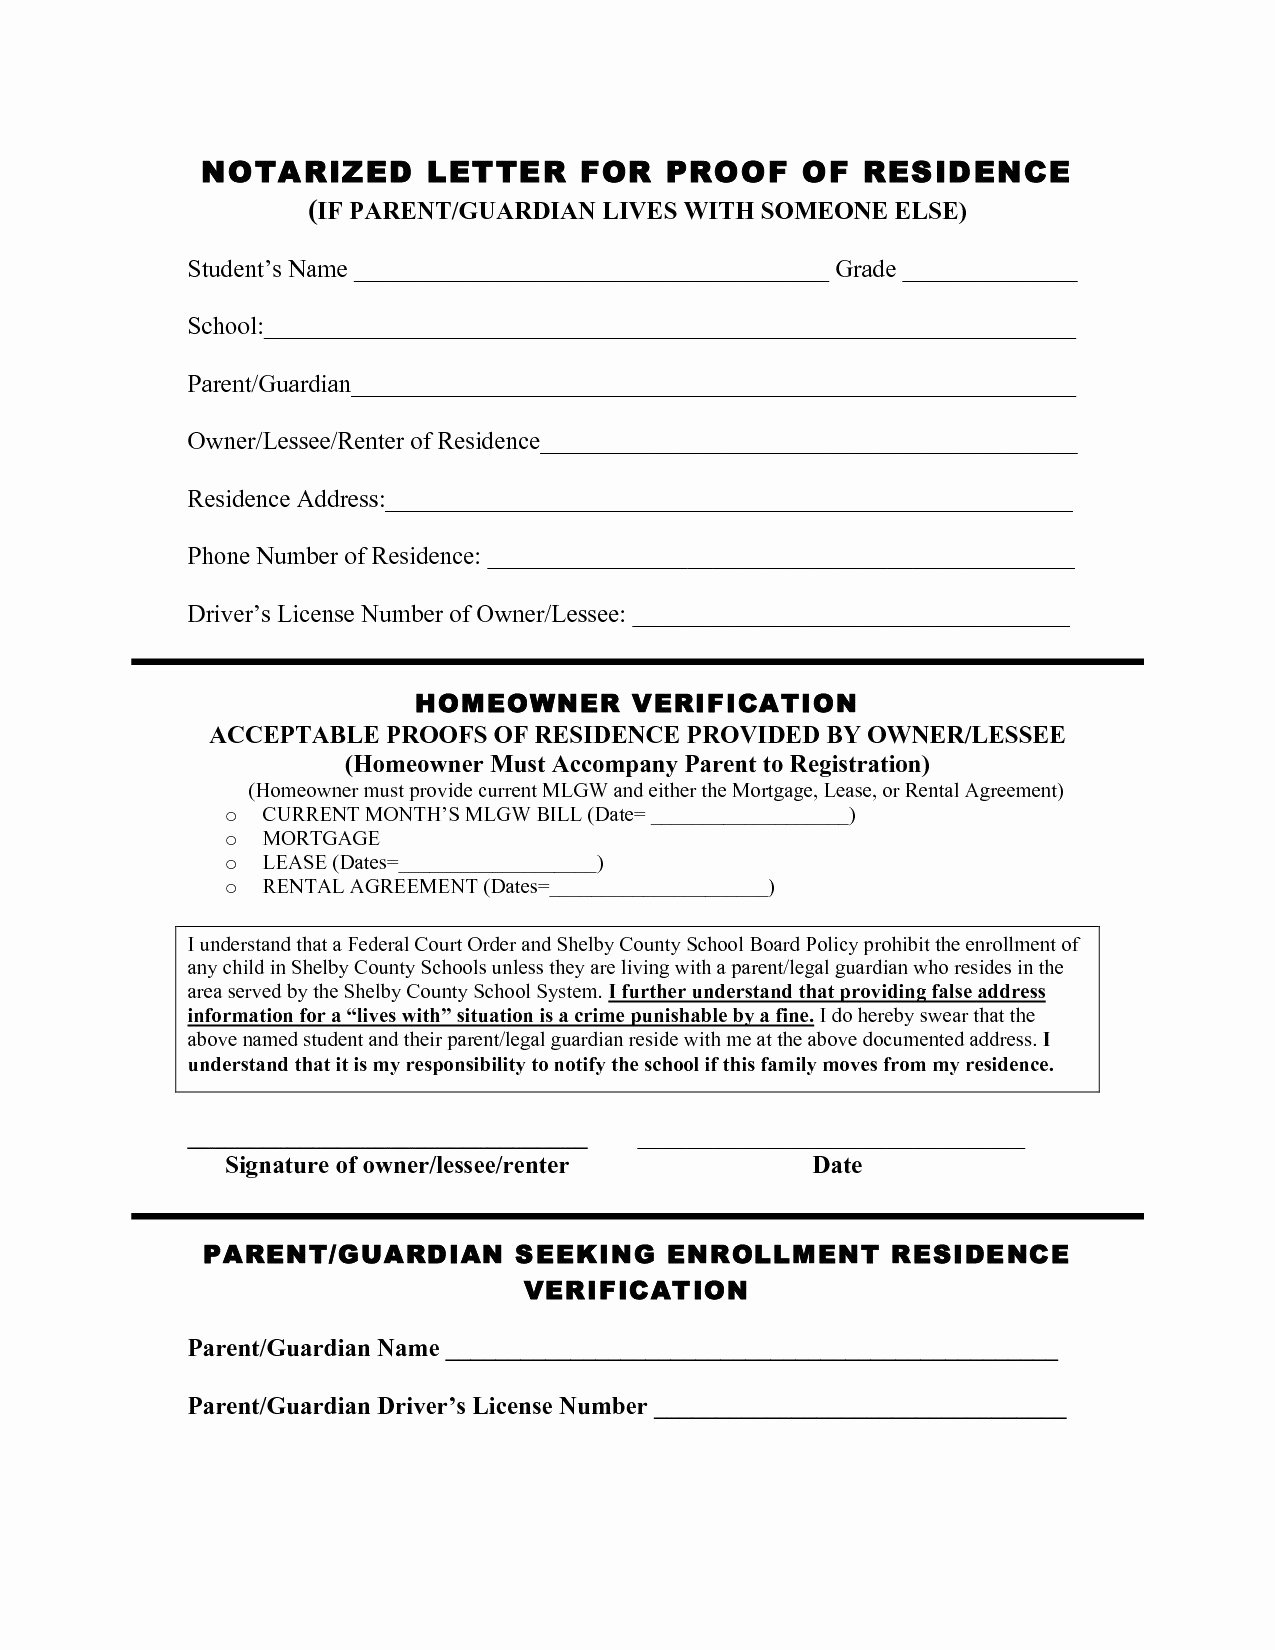 Printable Notarized Letter Of Residency Template Inspirational Notarized Proof Residency Letter for School